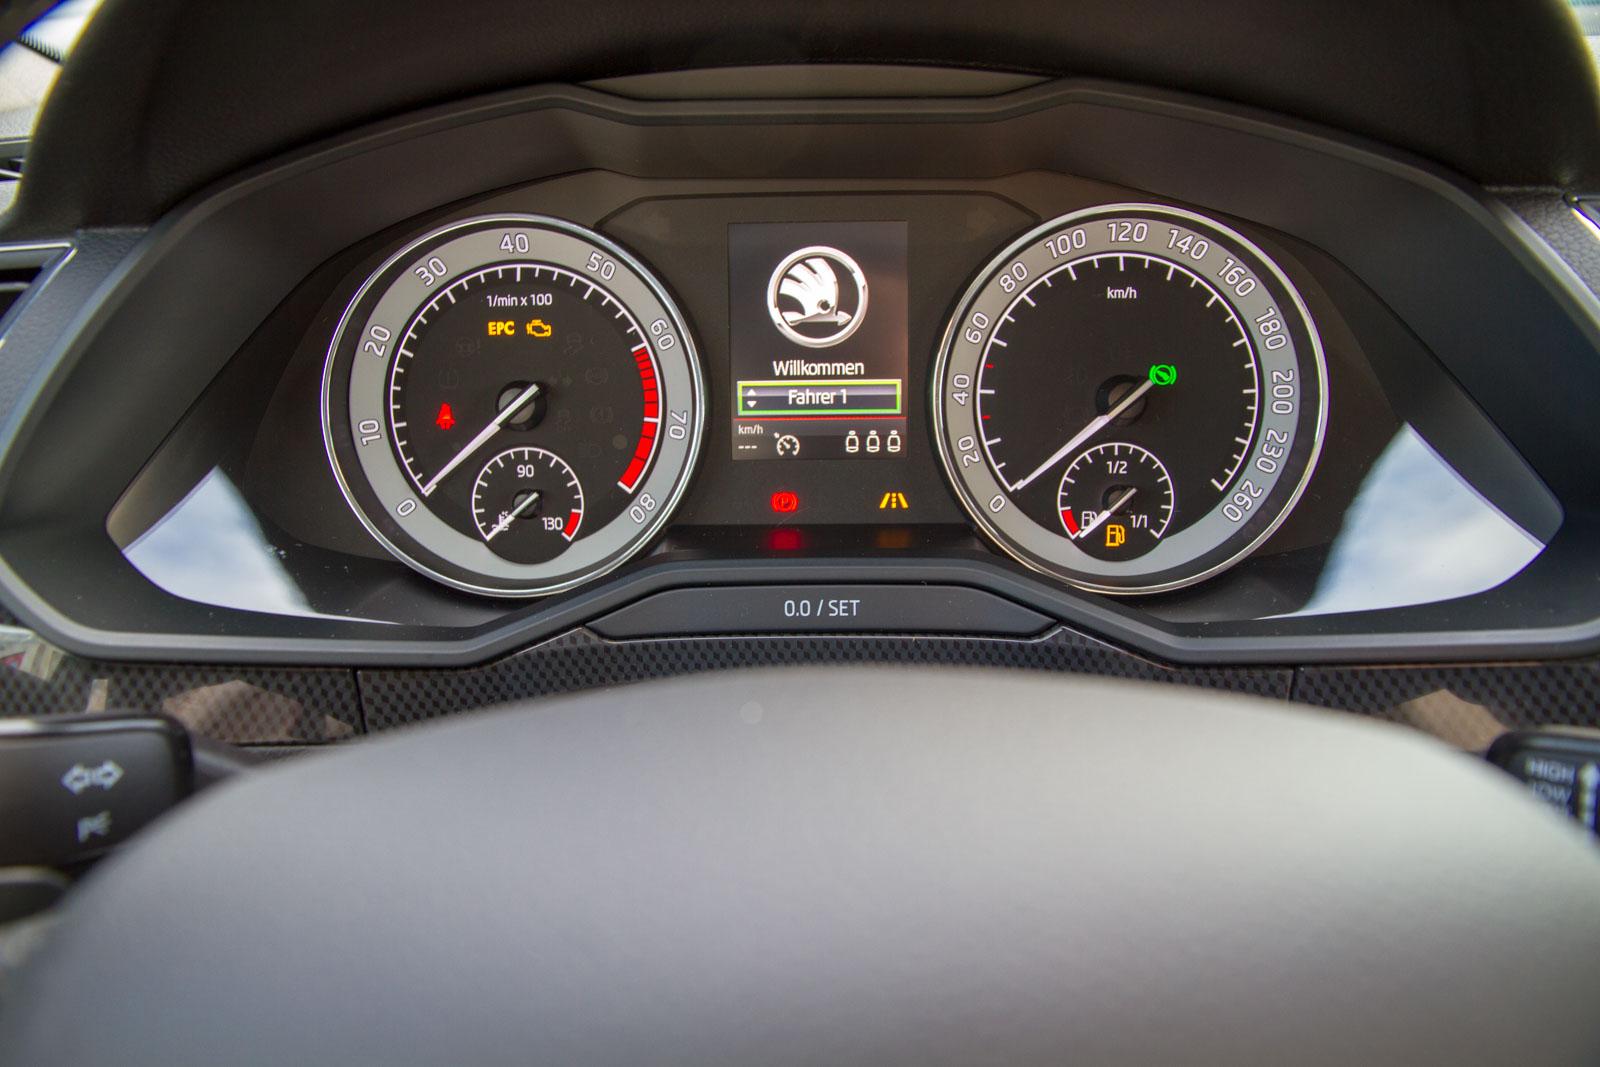 Skoda Superb Kombi Sportline 2.0 TSI DSG 4 x 4 / Deutsche Neufahrzeuge und EU-Neufahrzeuge – Aha! Fahrzeughandel GmbH in Althengstett